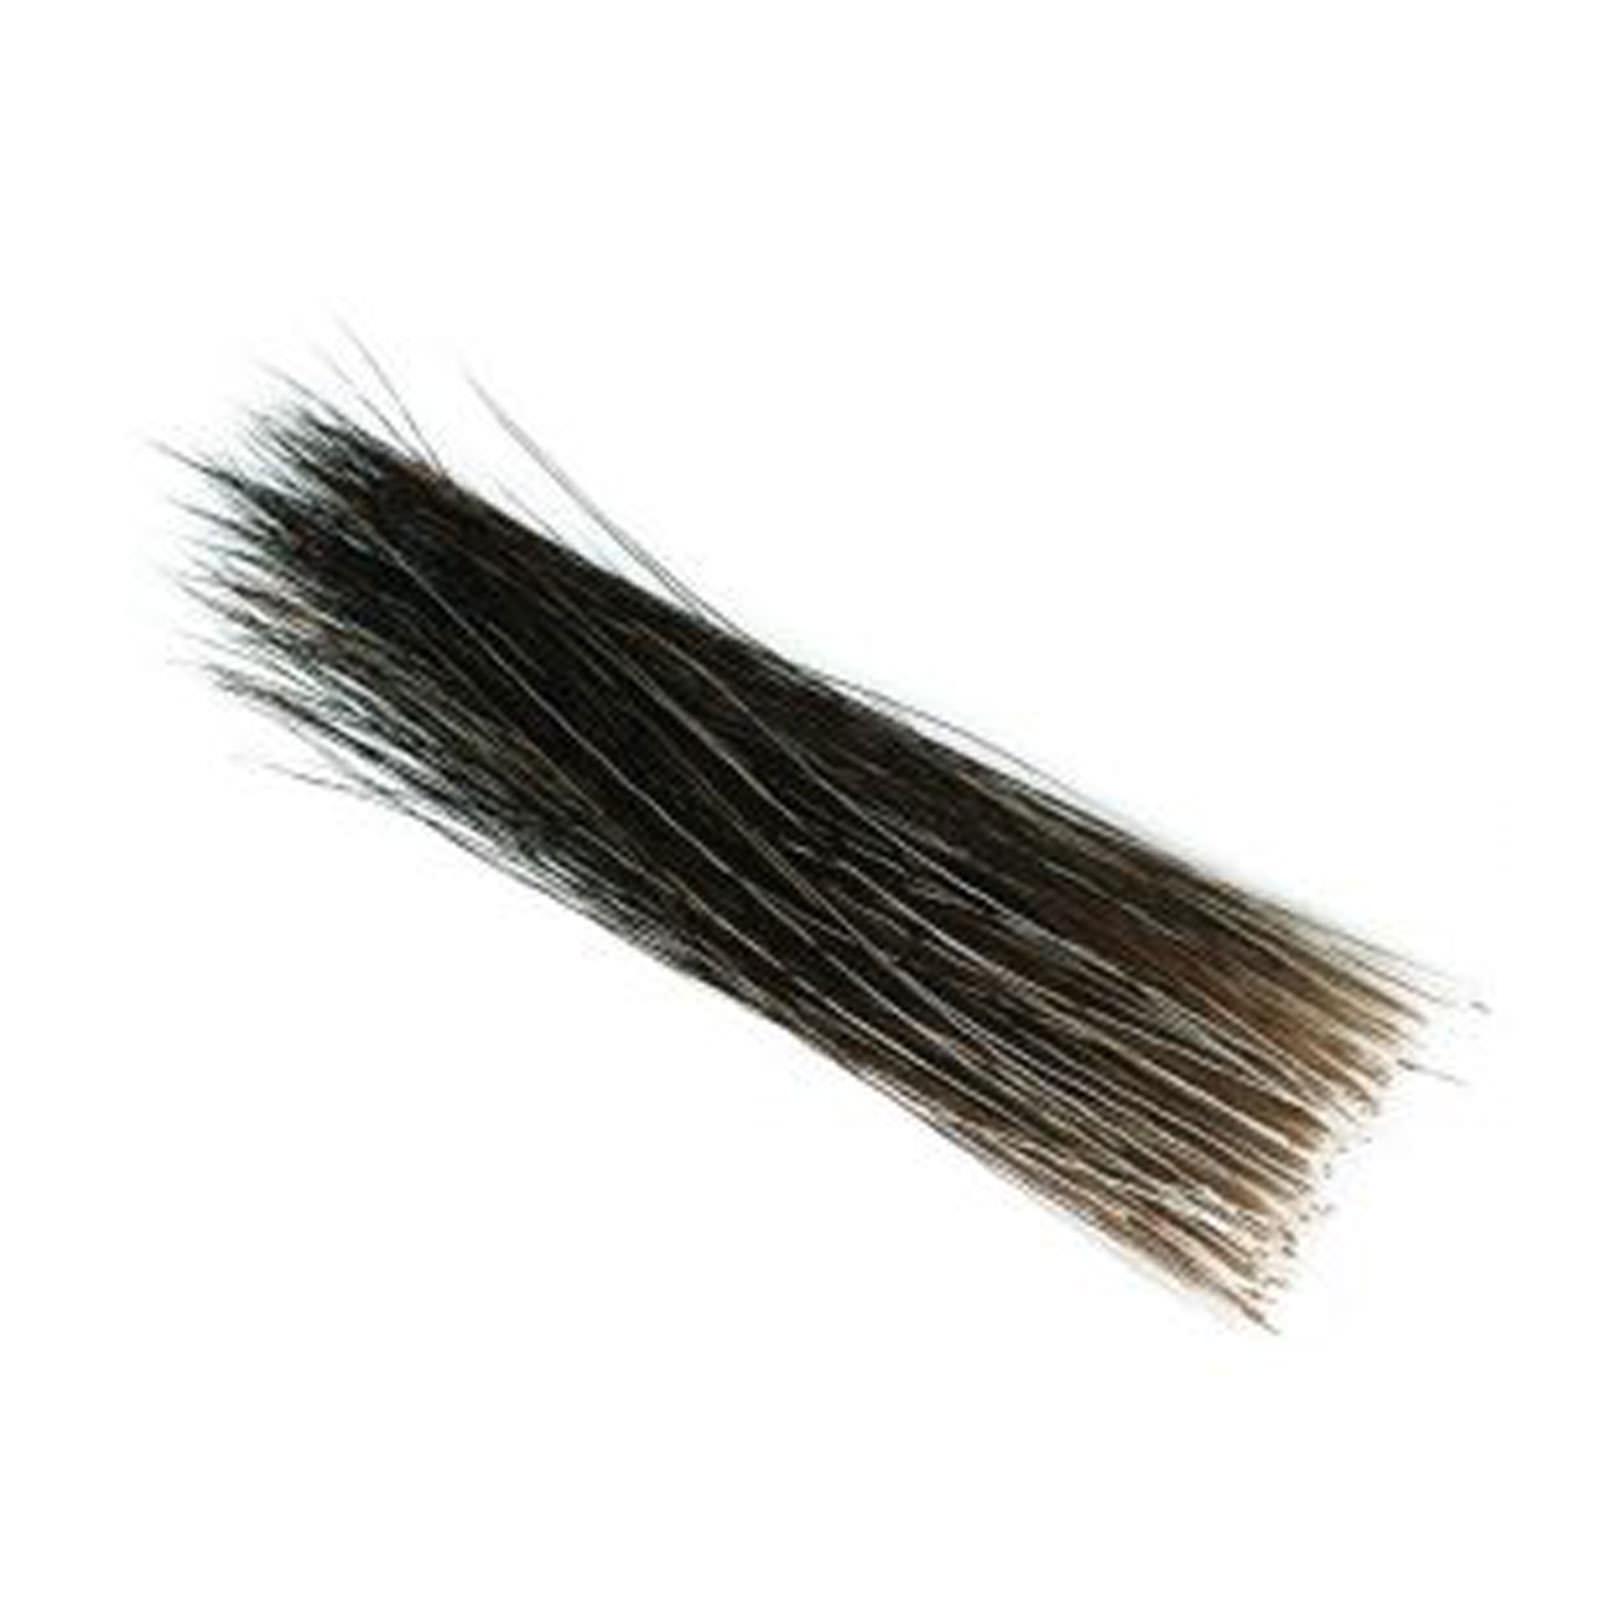 FISHAIR  2 1//2 INCHES LONG -SQUIRREL BROWN